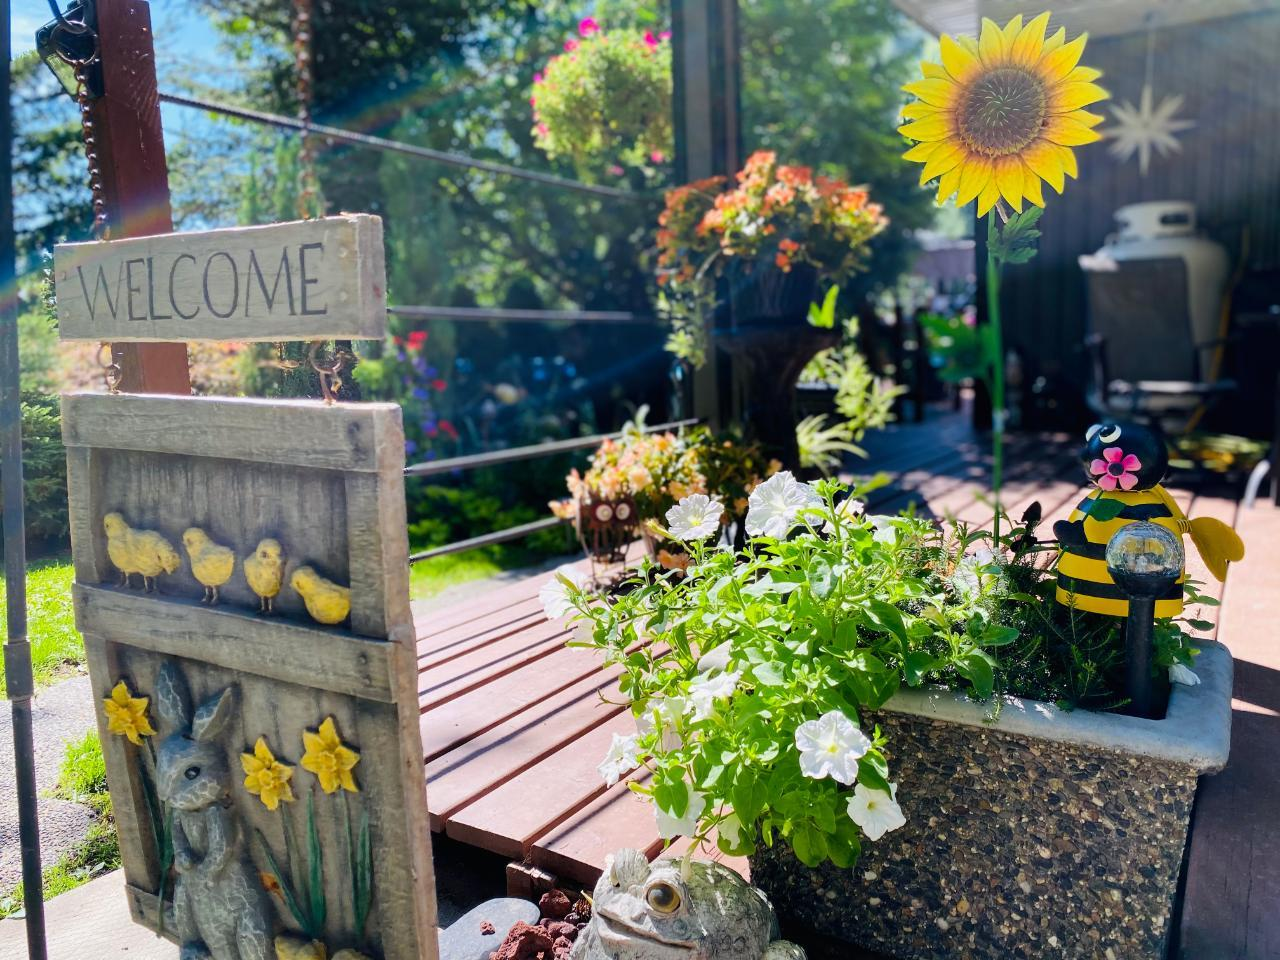 2505 Barley Road, Rossland, British Columbia  V0G 1Y0 - Photo 8 - 2461148